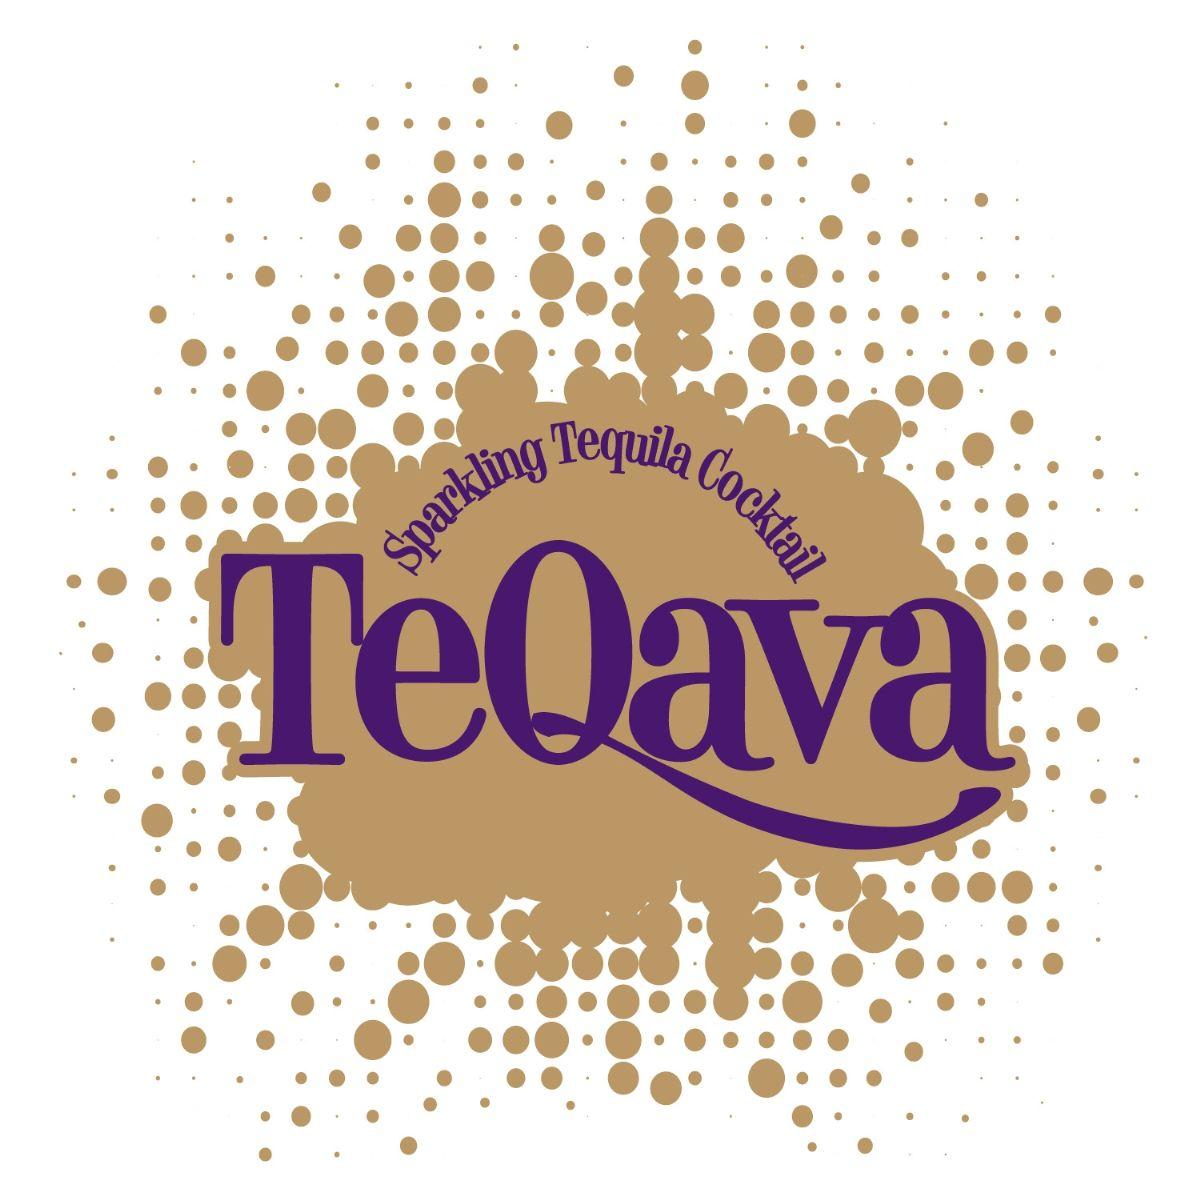 teqava pic